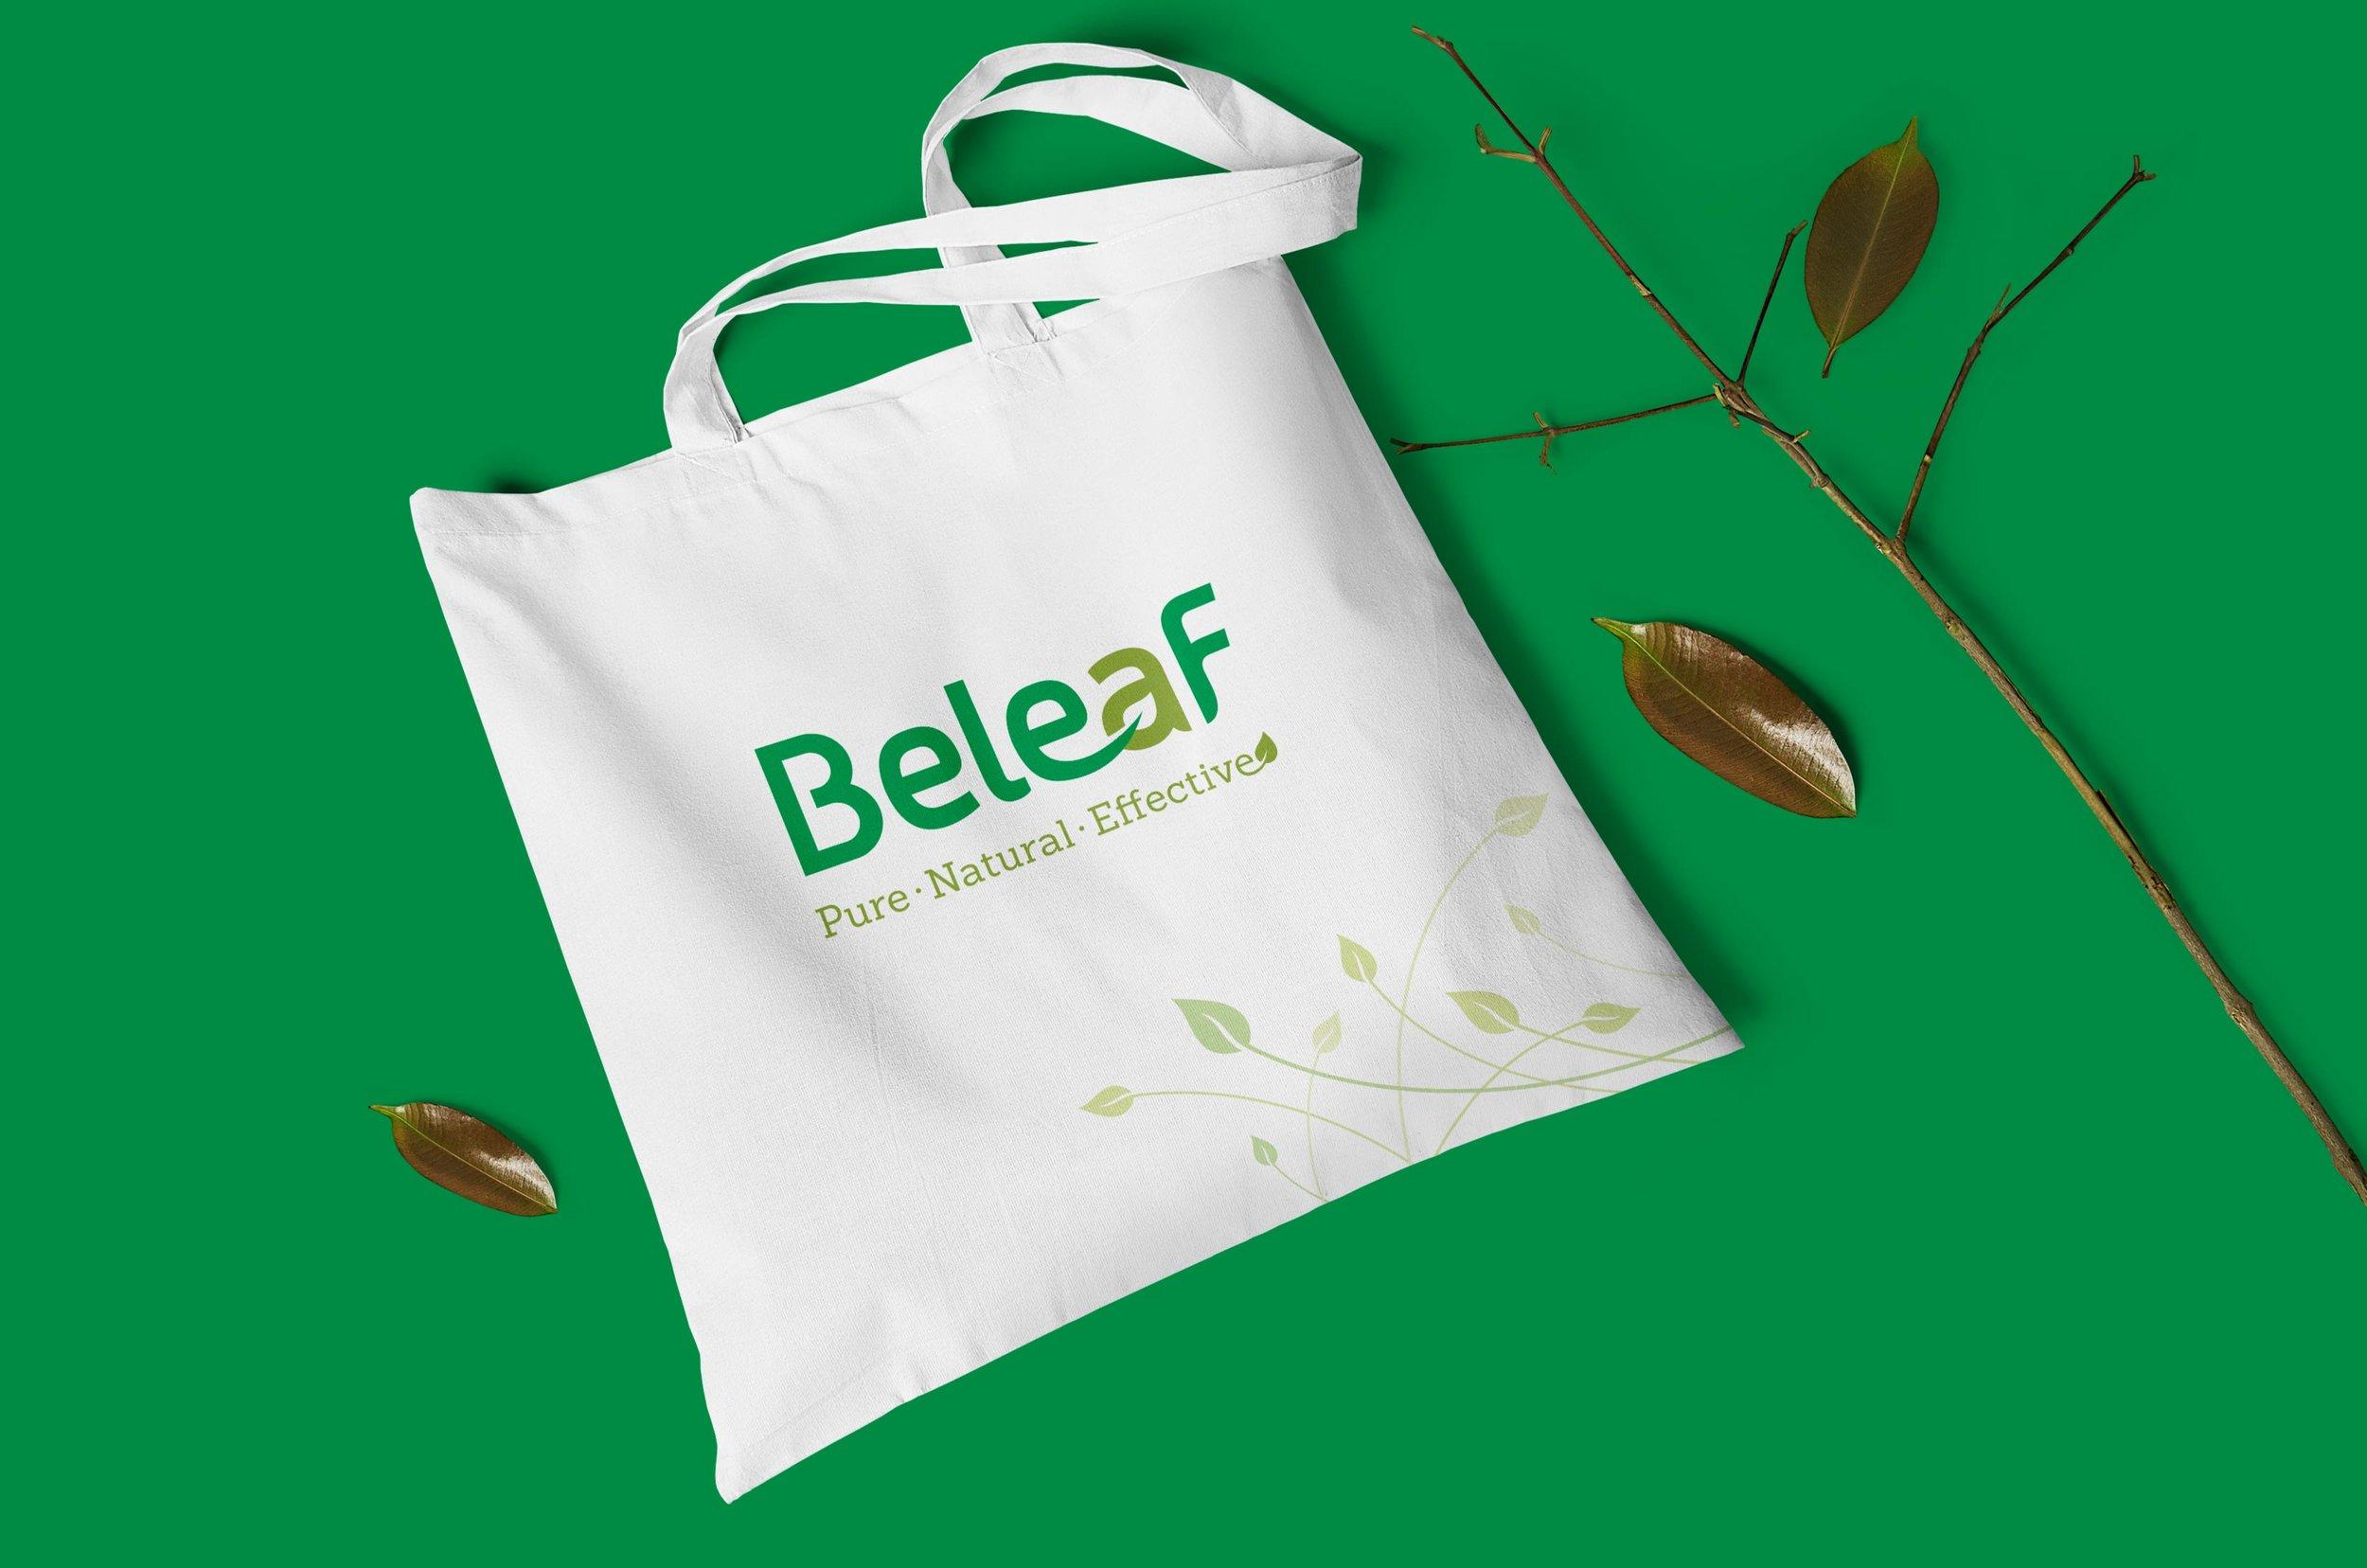 Beleaf_Branding_Elephant Design 4.jpg